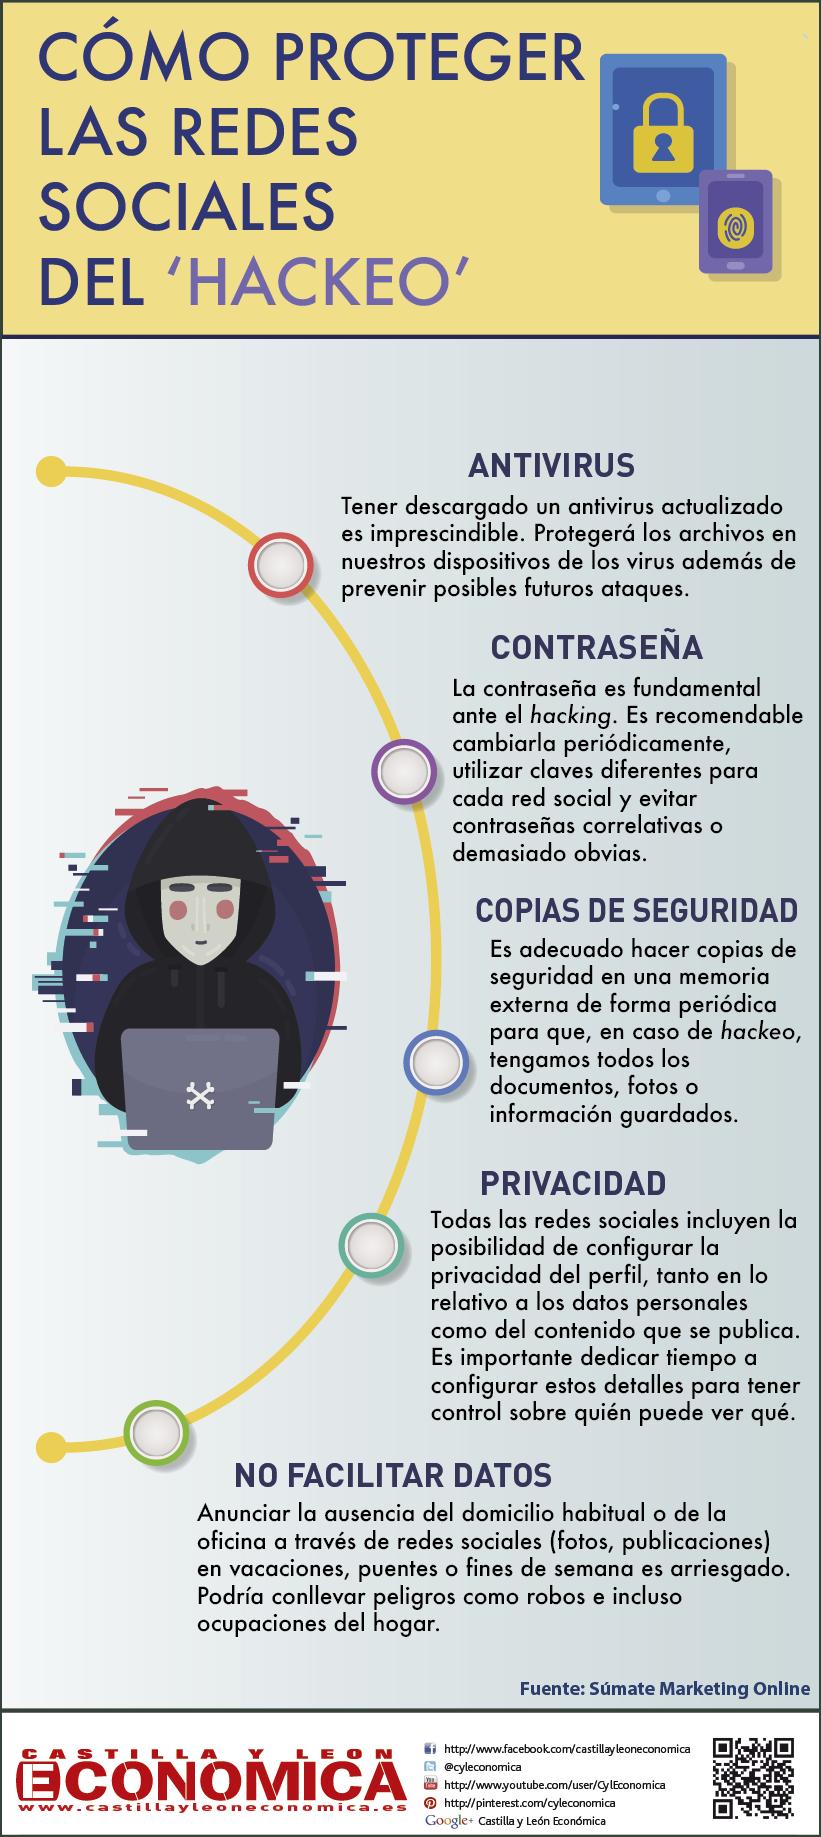 protegerredessociales-01